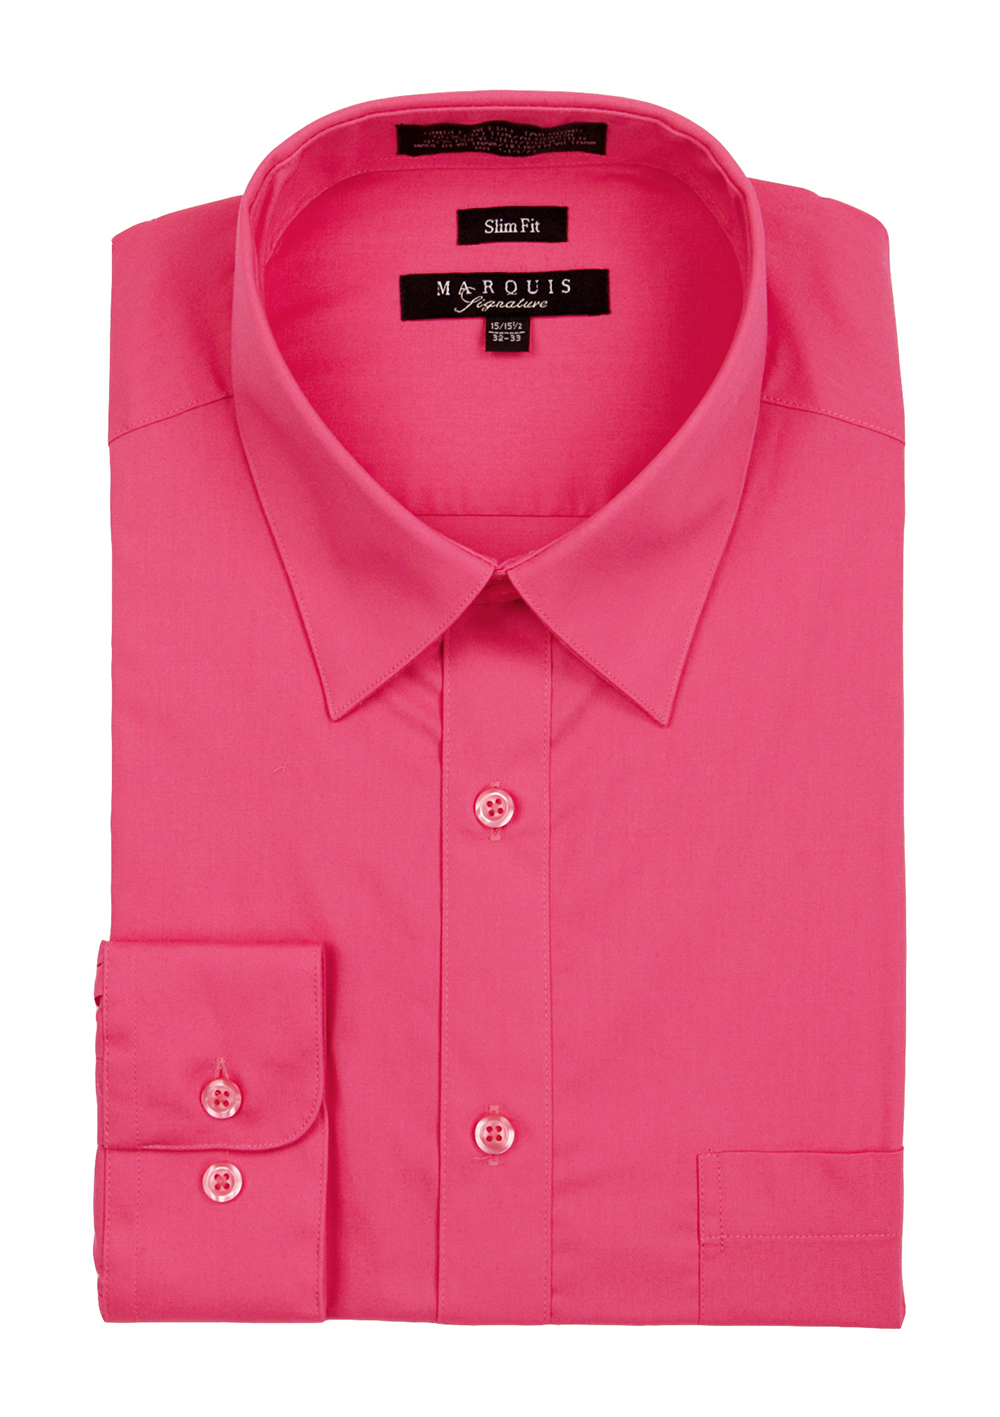 Basic Slim Fit Dress Shirts M A R Q U I S